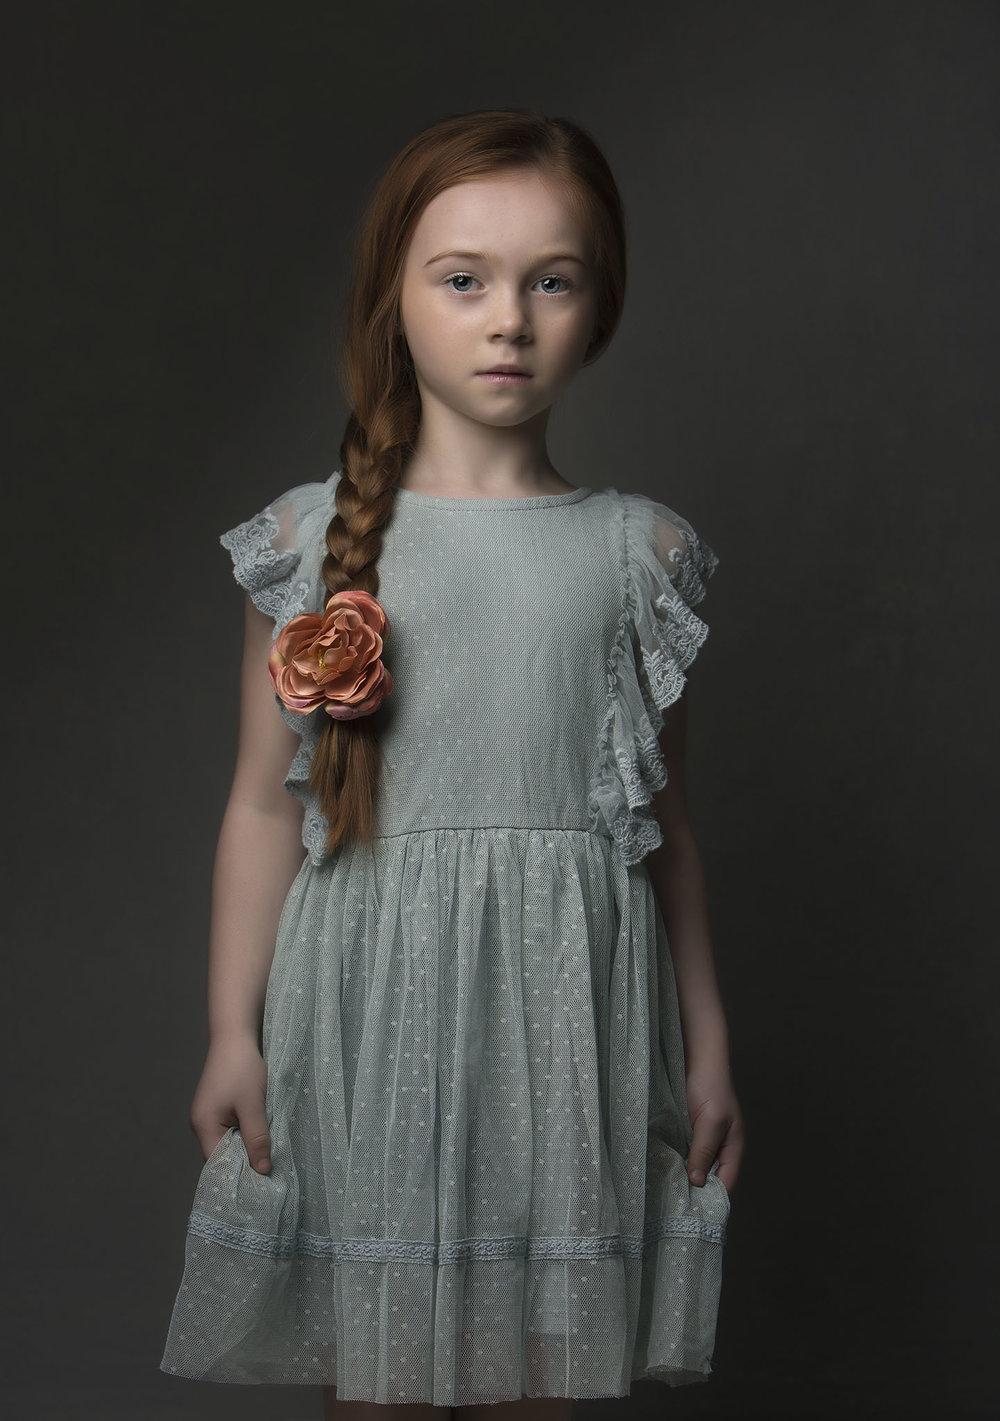 elizabethgphotography_kingslangley_hertfordshire_fineart_childrens_photography_31.jpg